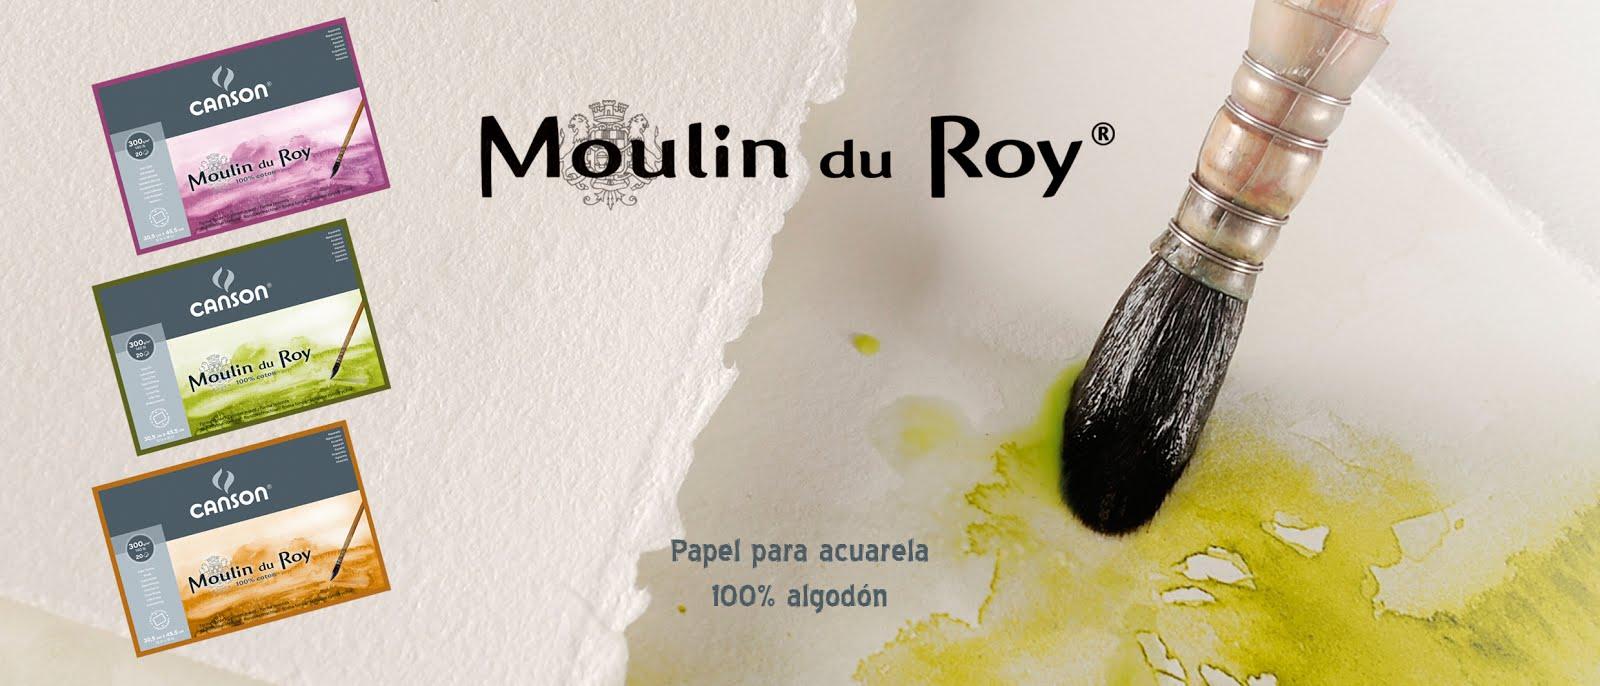 Moulin du Roy